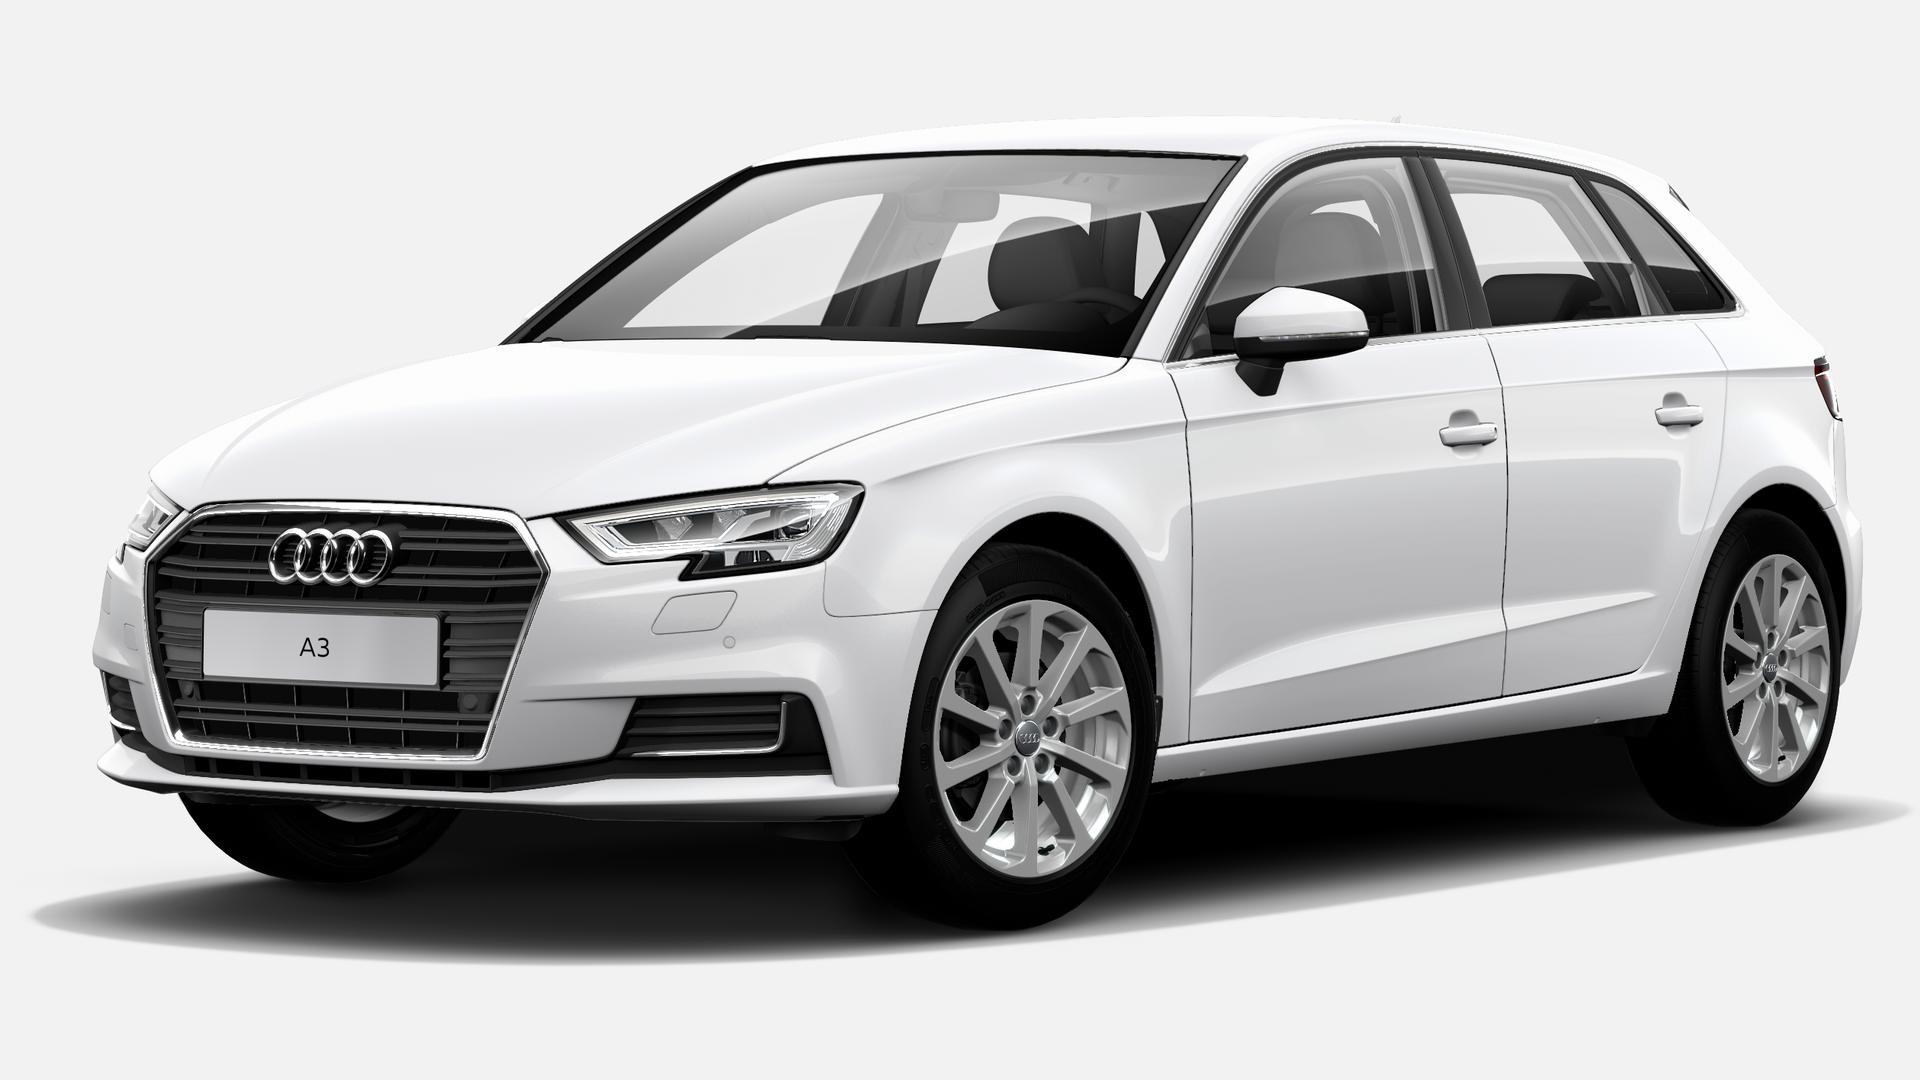 Audi A3 Sportback 1.6 TDI Design Edition 85 kW (116 CV)  nuevo en Álava